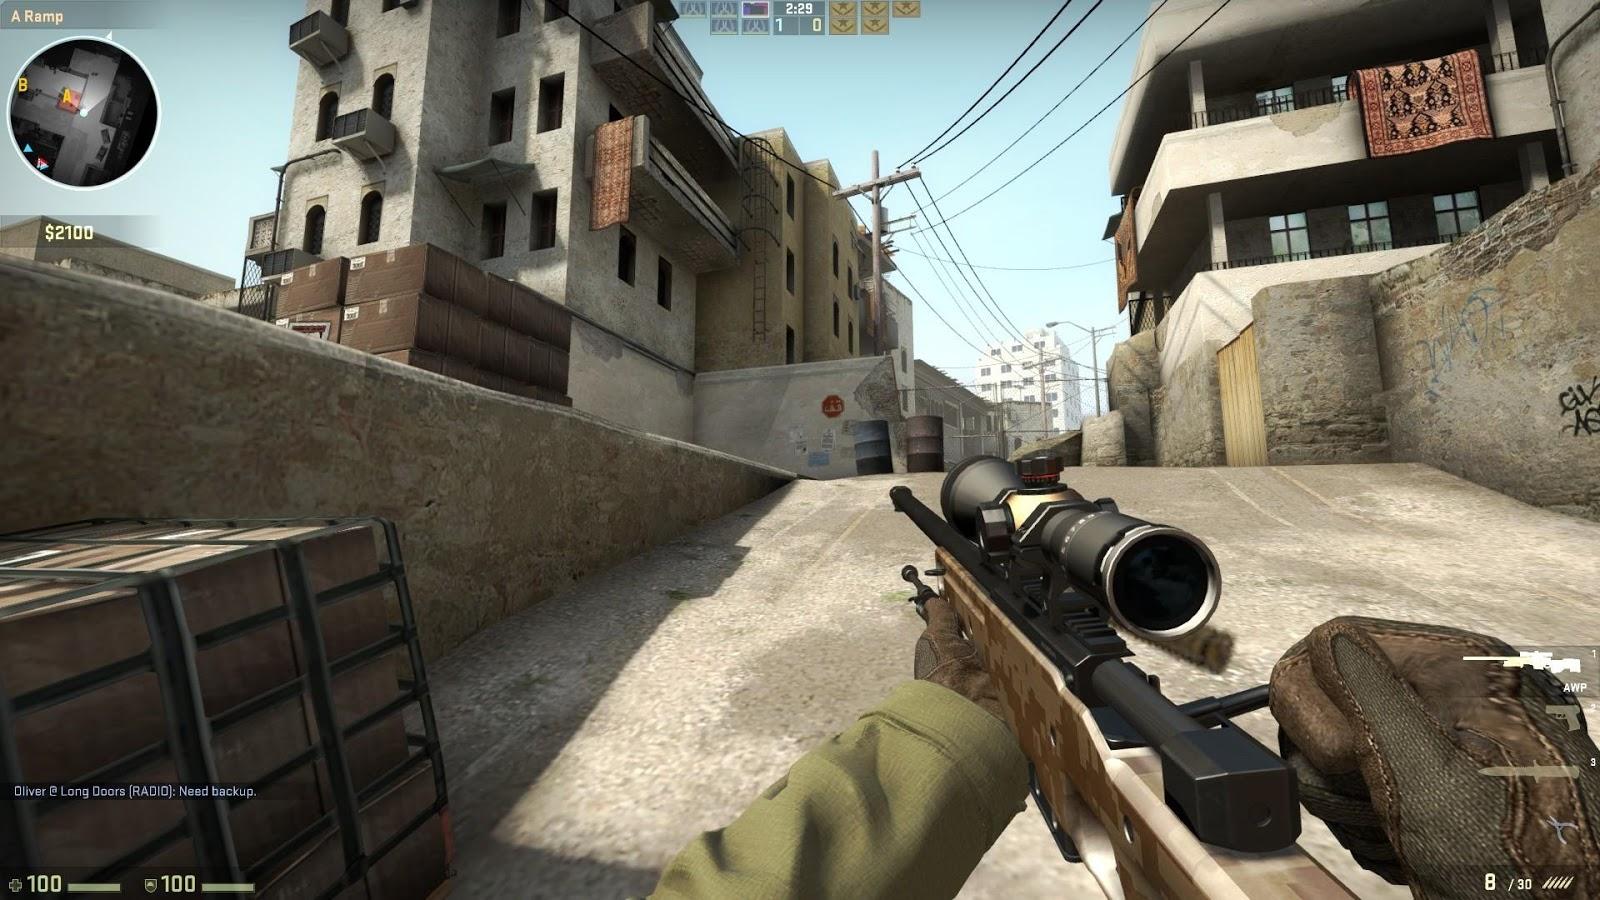 CSGO rifle